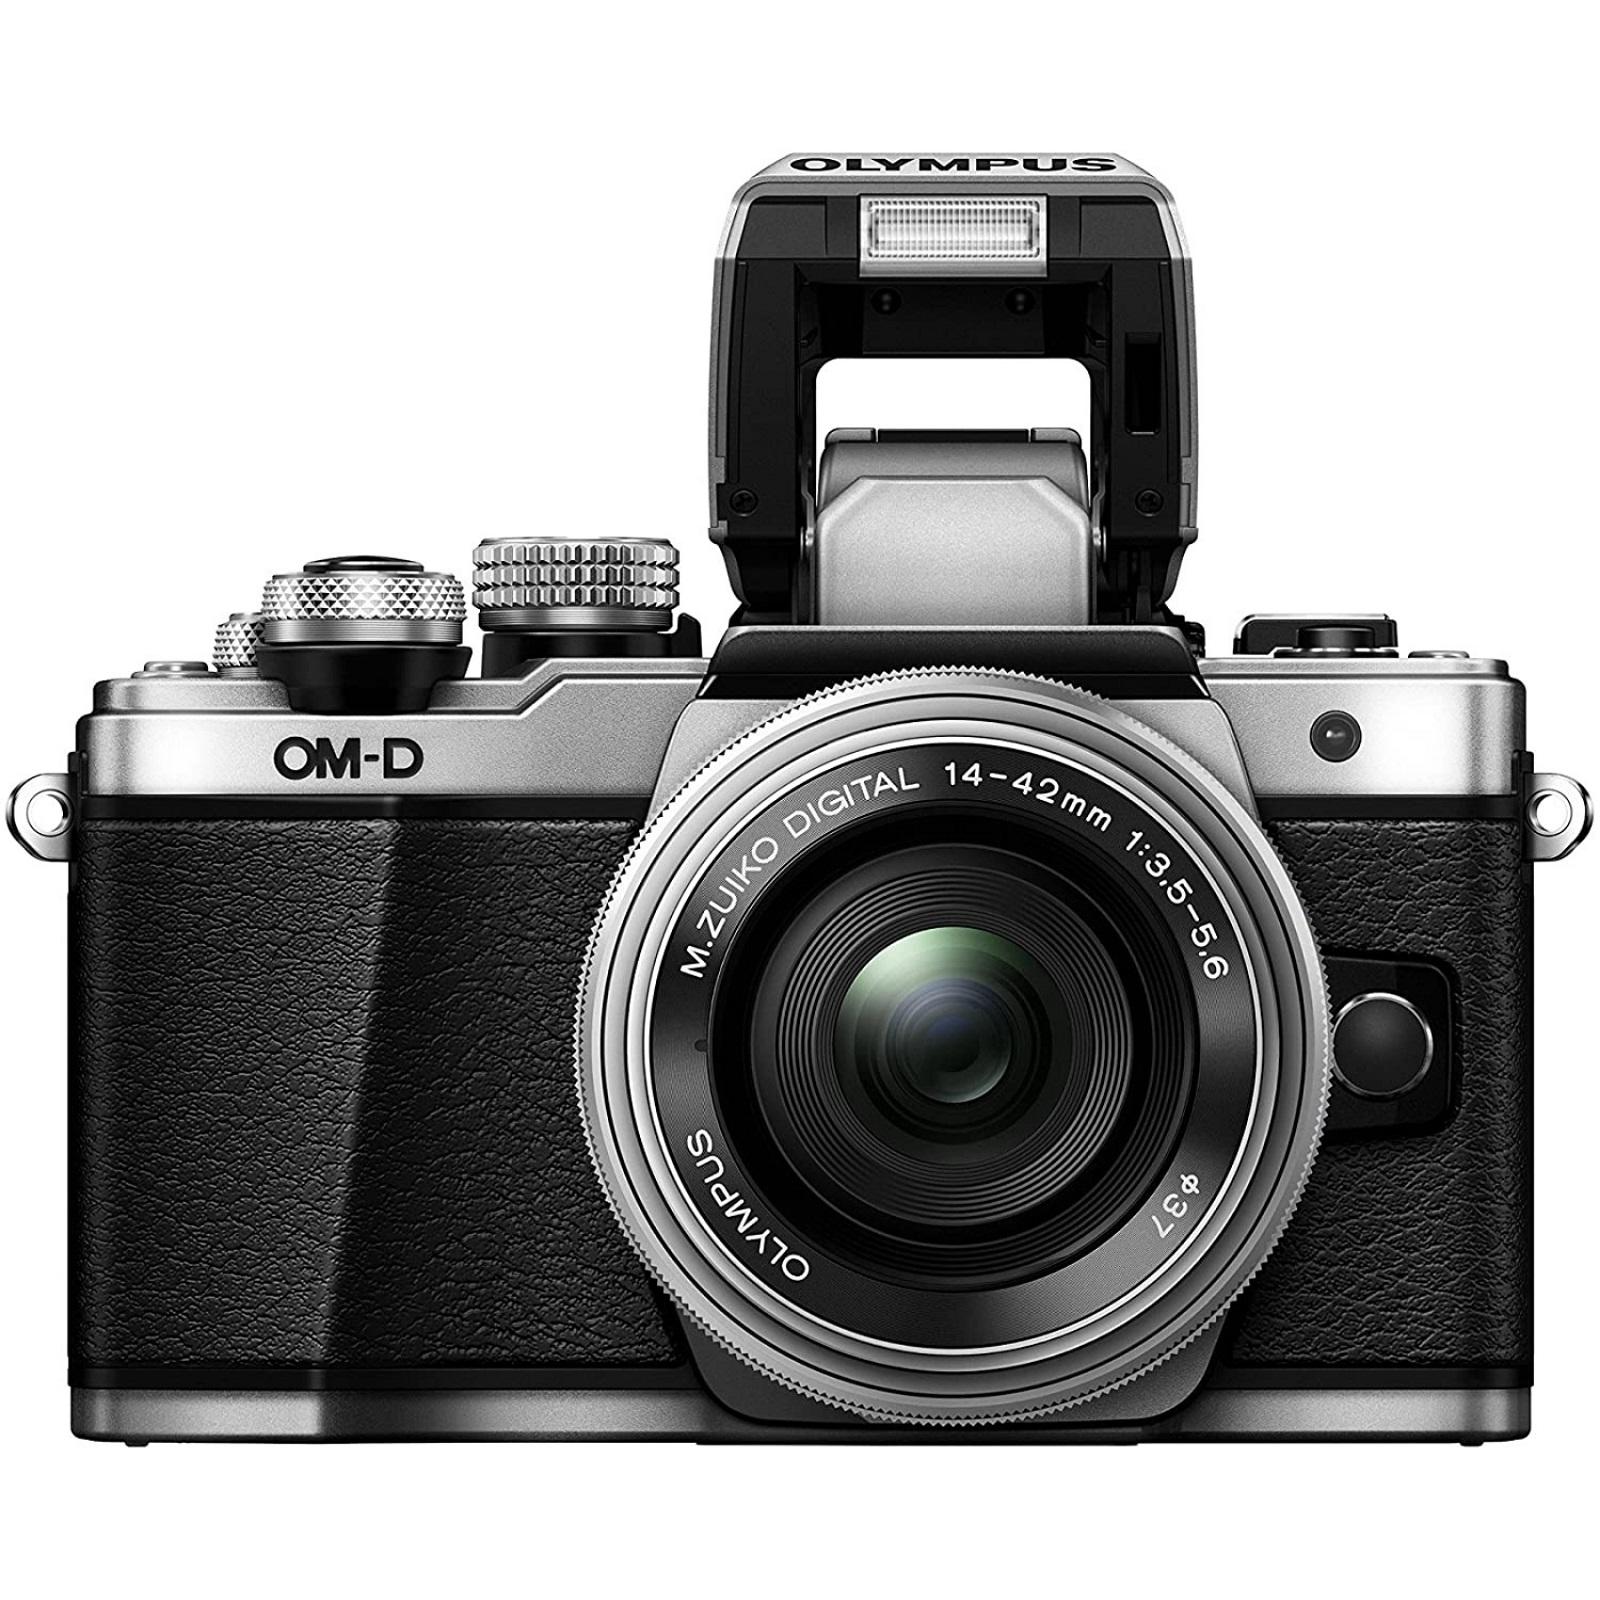 OLYMPUS オリンパス ミラーレス一眼 OM-D E-M10 MarkII 14-42mm EZレンズキット シルバー 新品